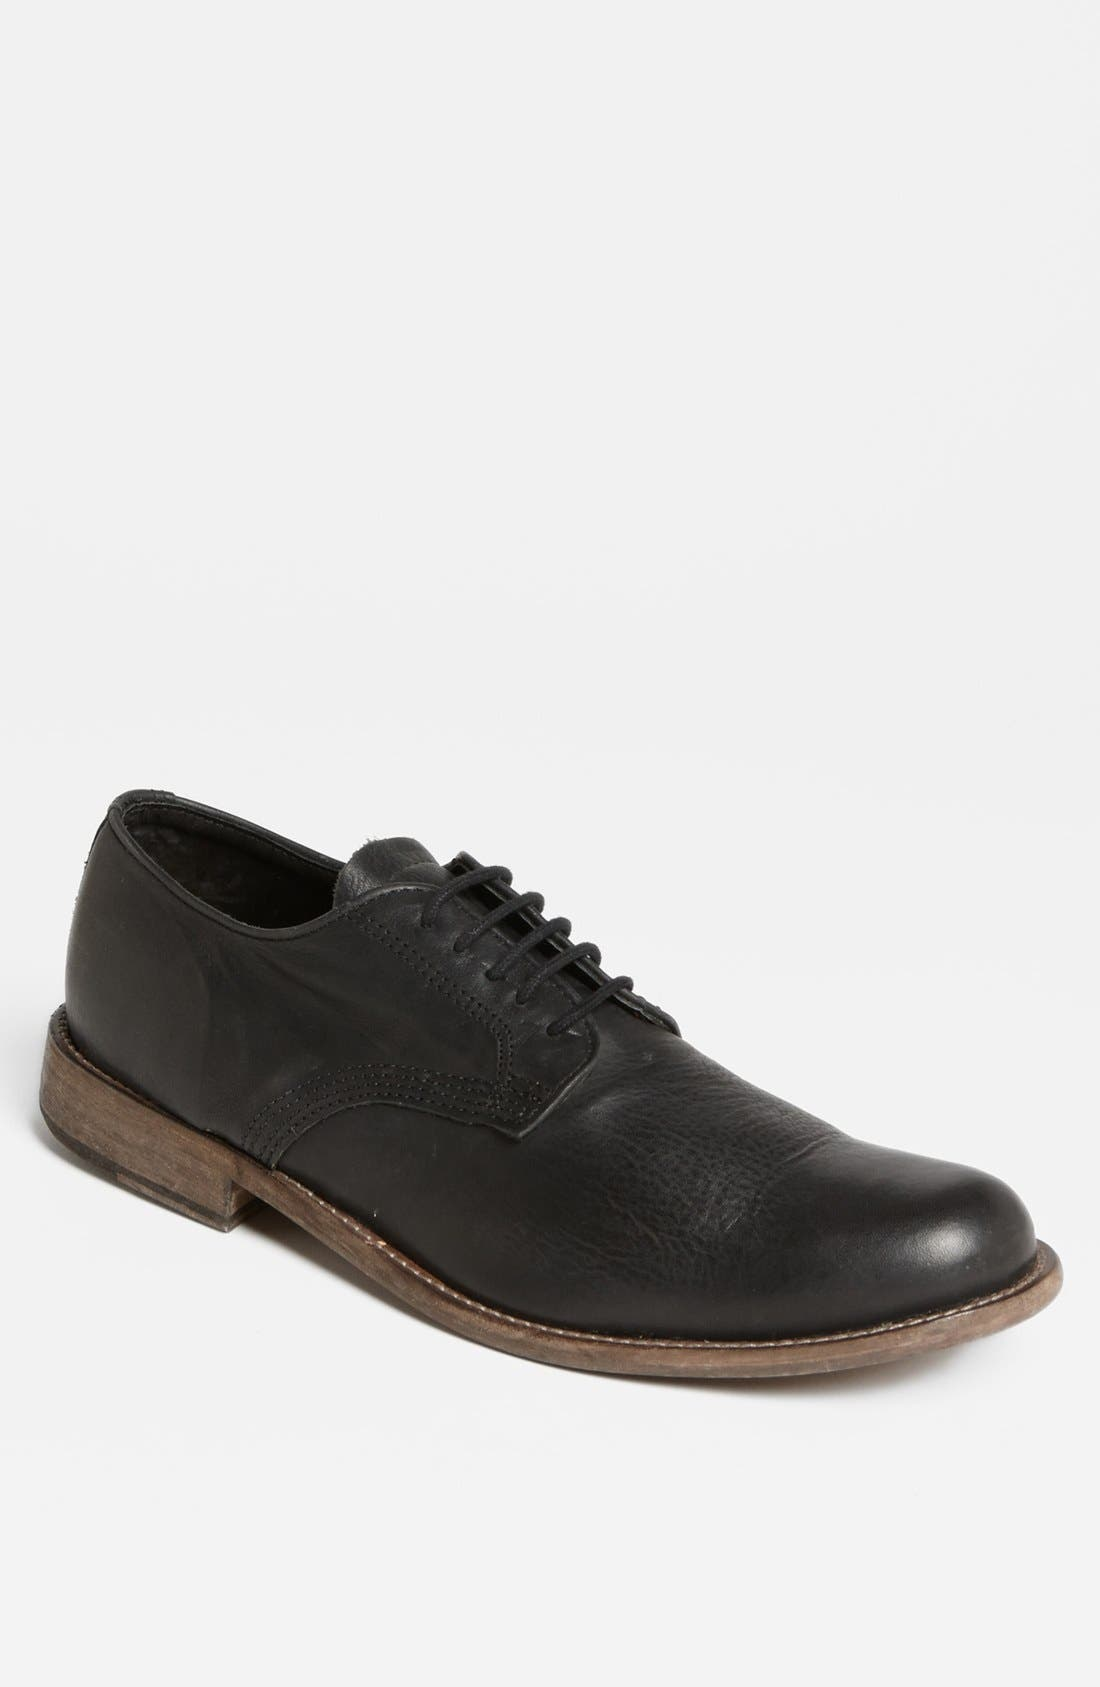 Alternate Image 1 Selected - Vintage Shoe Company 'Henry' Derby